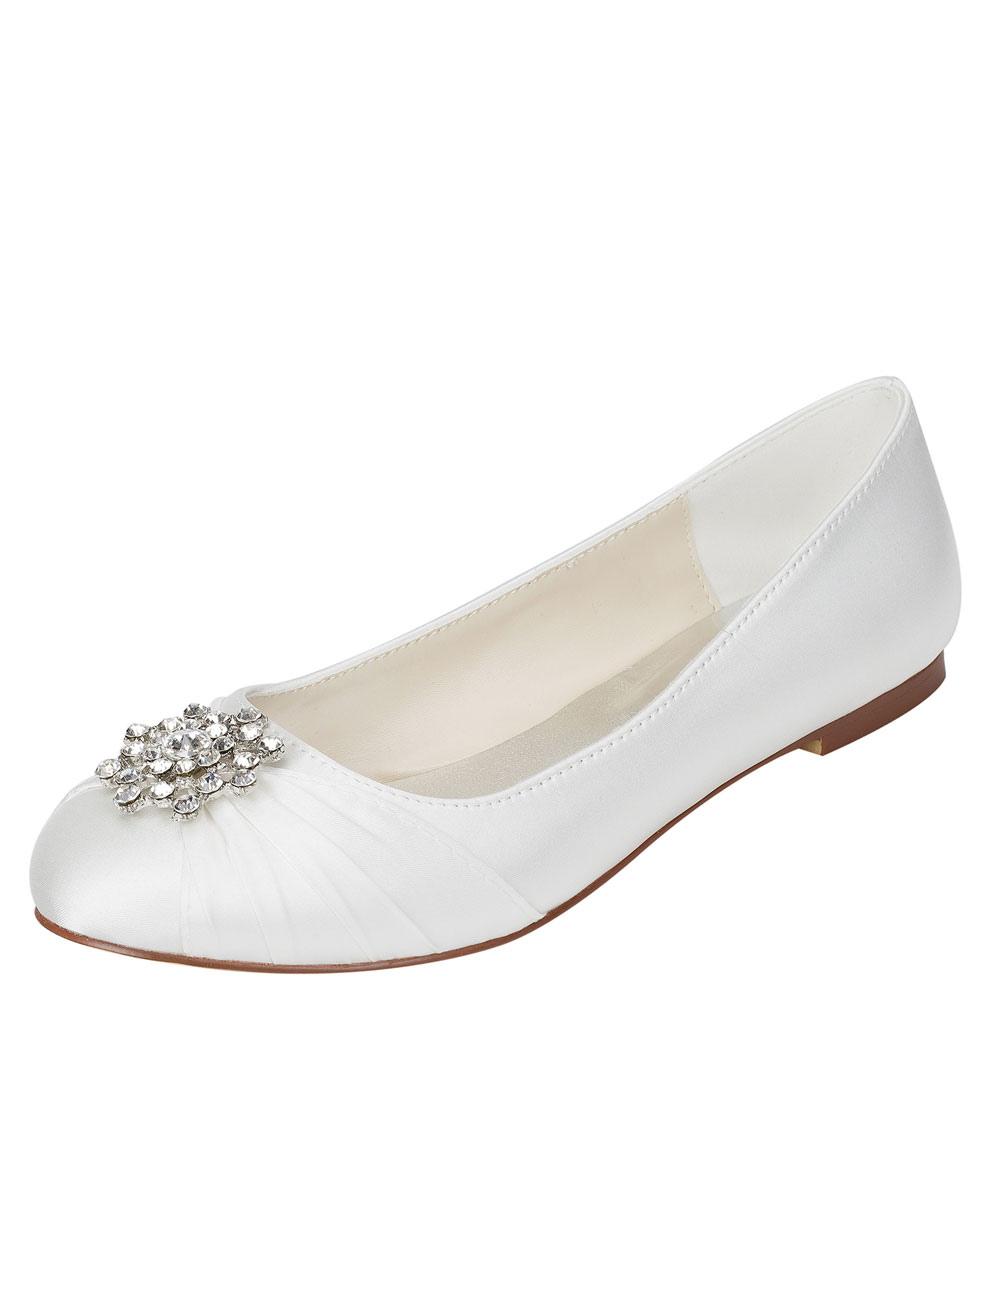 Ivory Wedding Shoes Silk Rhinestone Pleated Round Toe Slip On Bridal Flat Pumps